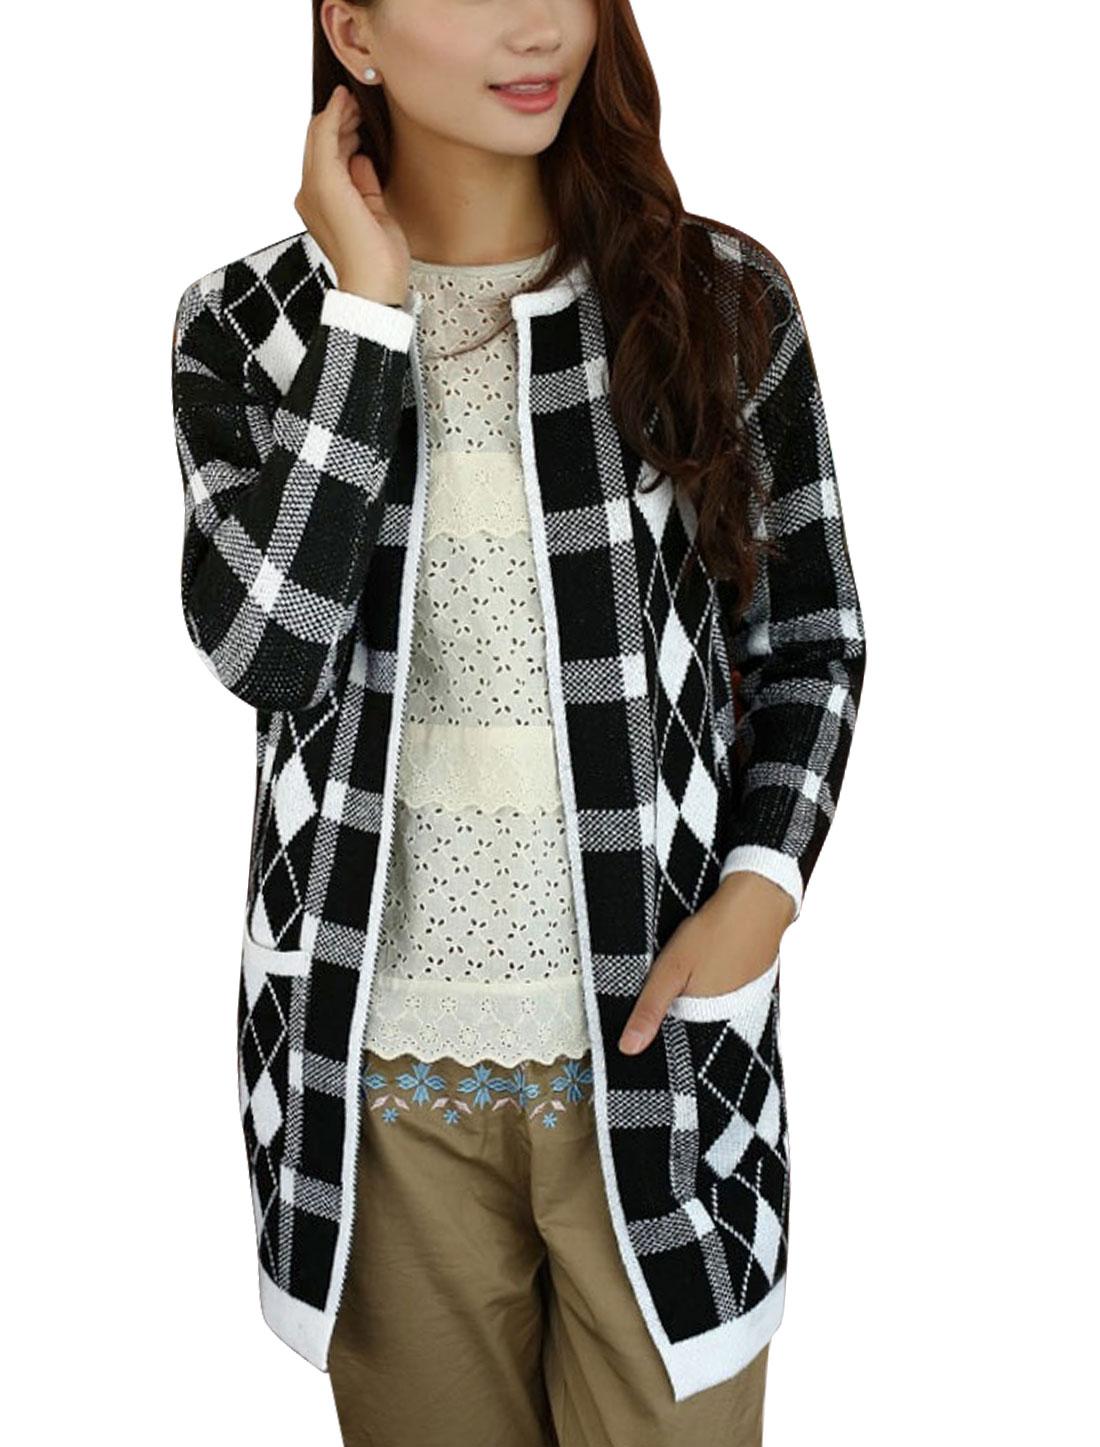 Women Long Dolman Sleeves Argyle Check Pattern Tunic Knit Cardigan Black S